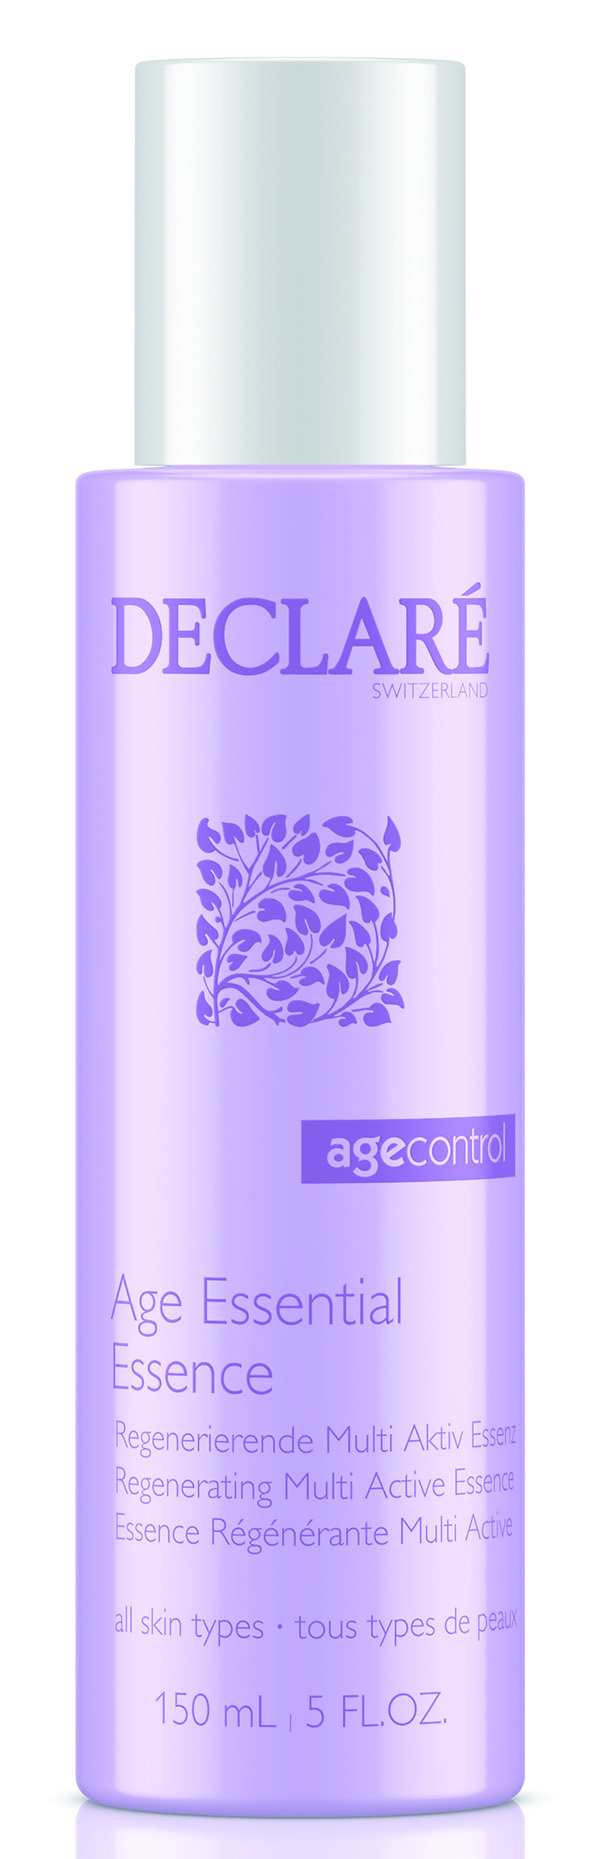 DECLARE Эссенция-активатор энергетическая для лица / Age Essential Essence 150 мл